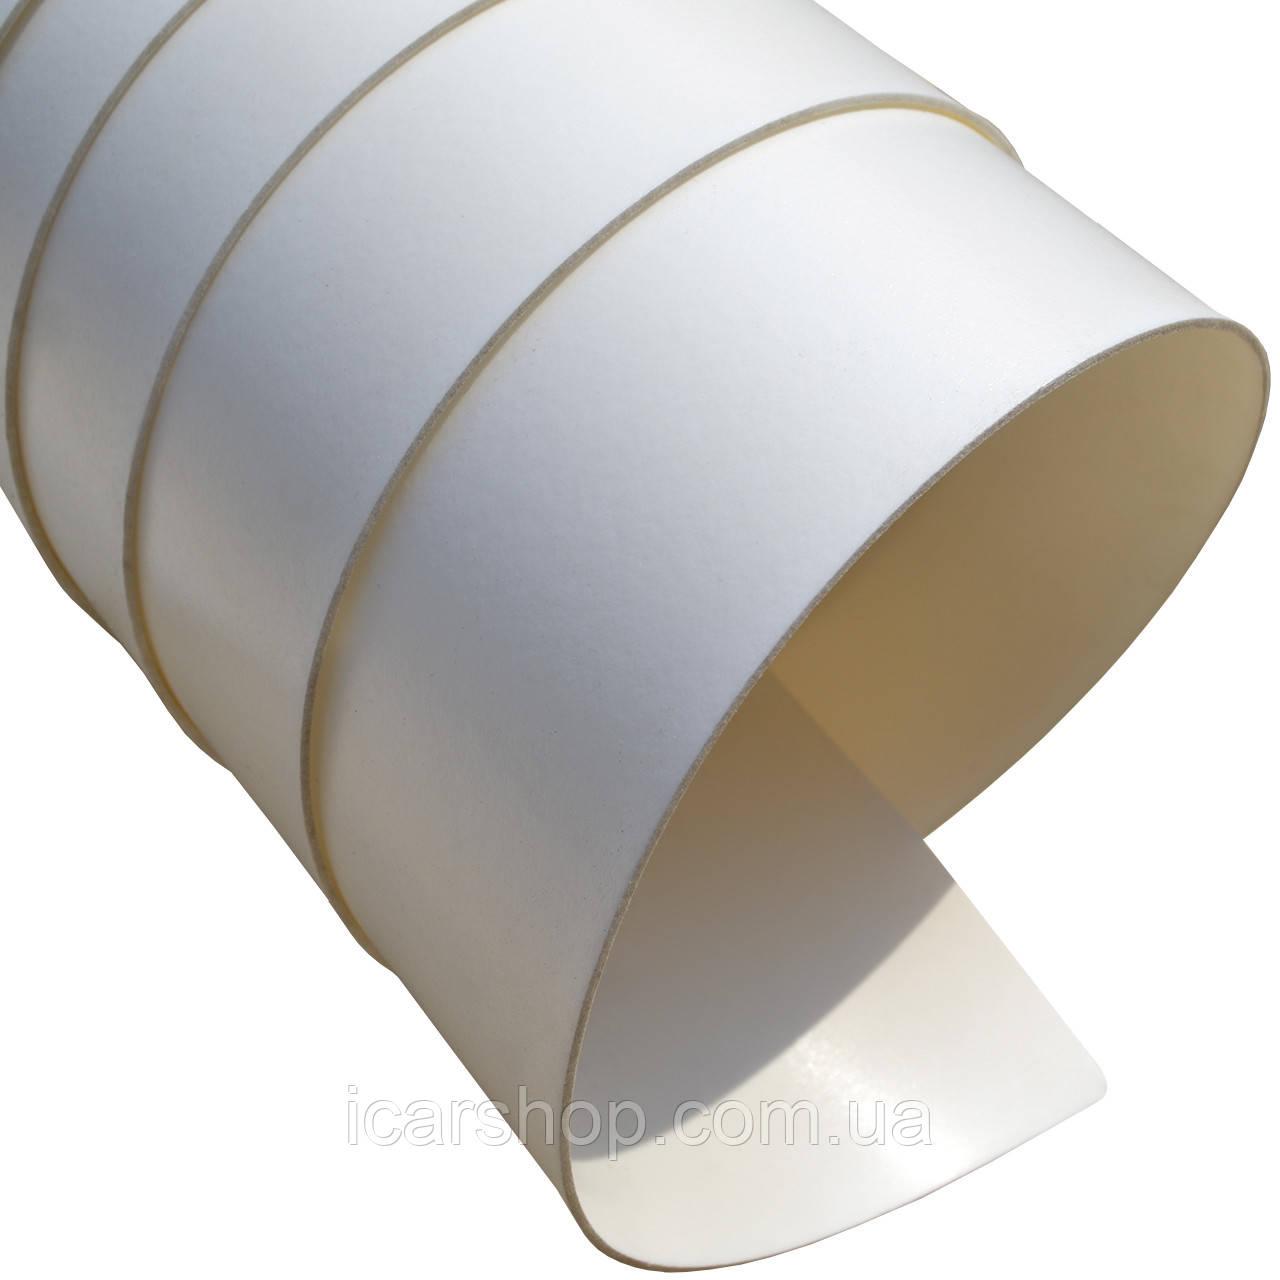 Шумоизоляция ISOLON 500 0502 AV W0.8